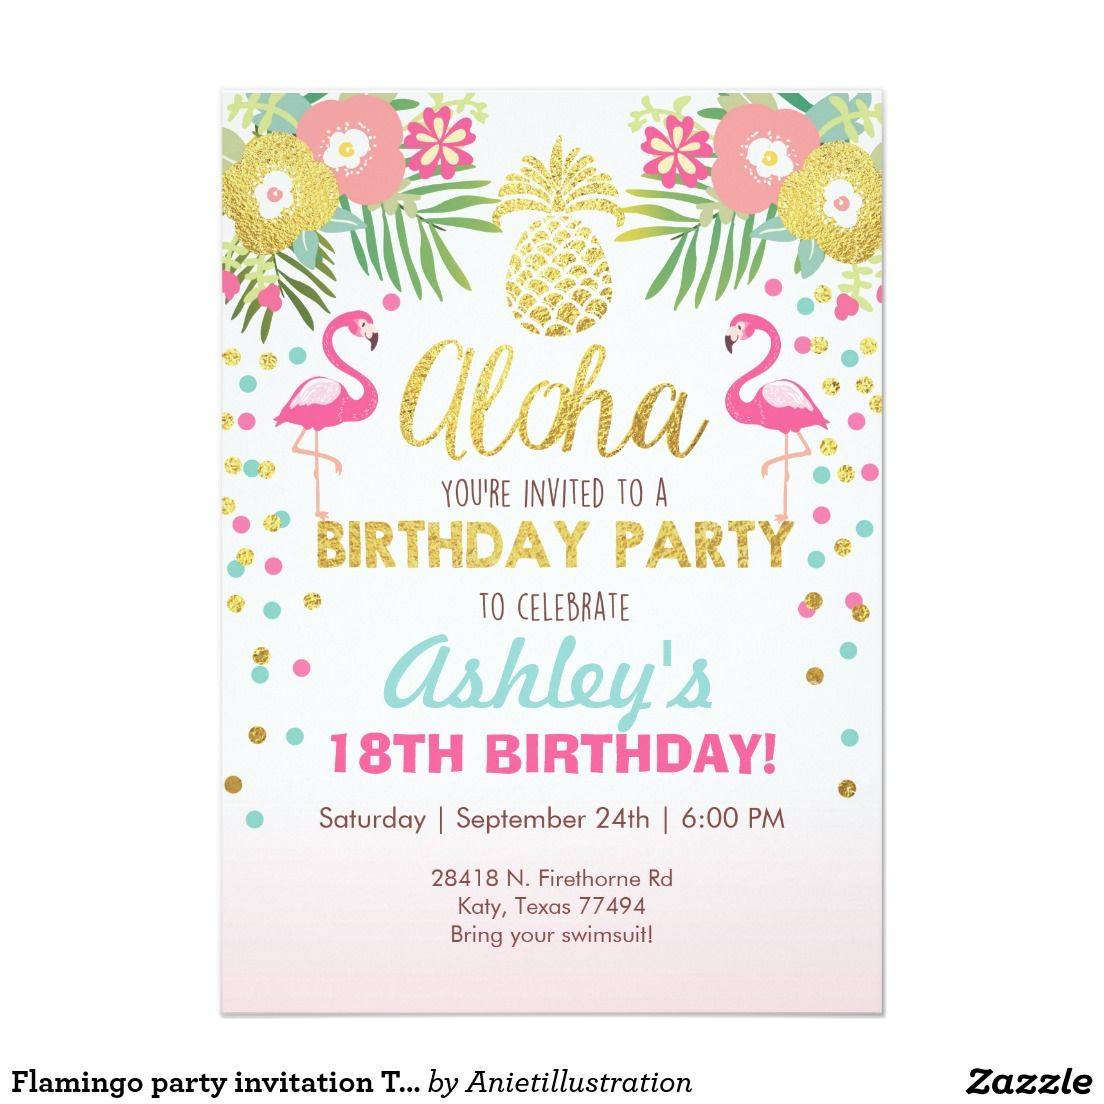 Your Custom X Invitations Th Birthday Pinterest - Birthday invitation zazzle